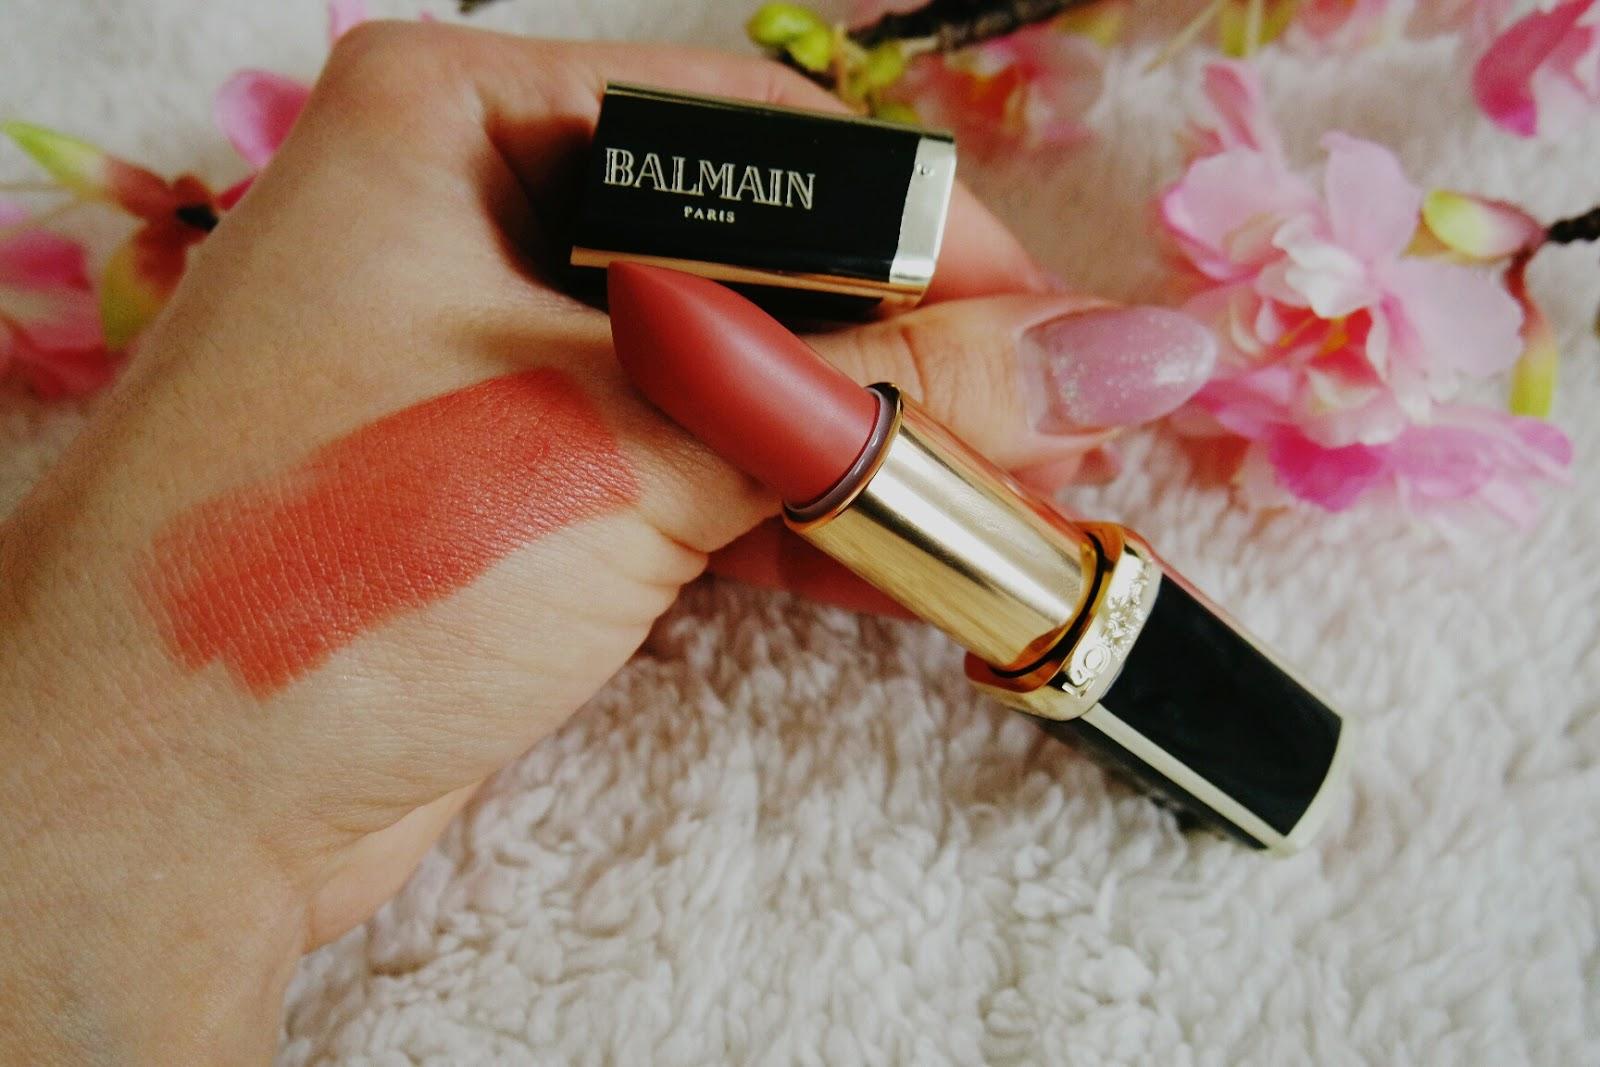 Balmain Confession Lippenstift Swatch